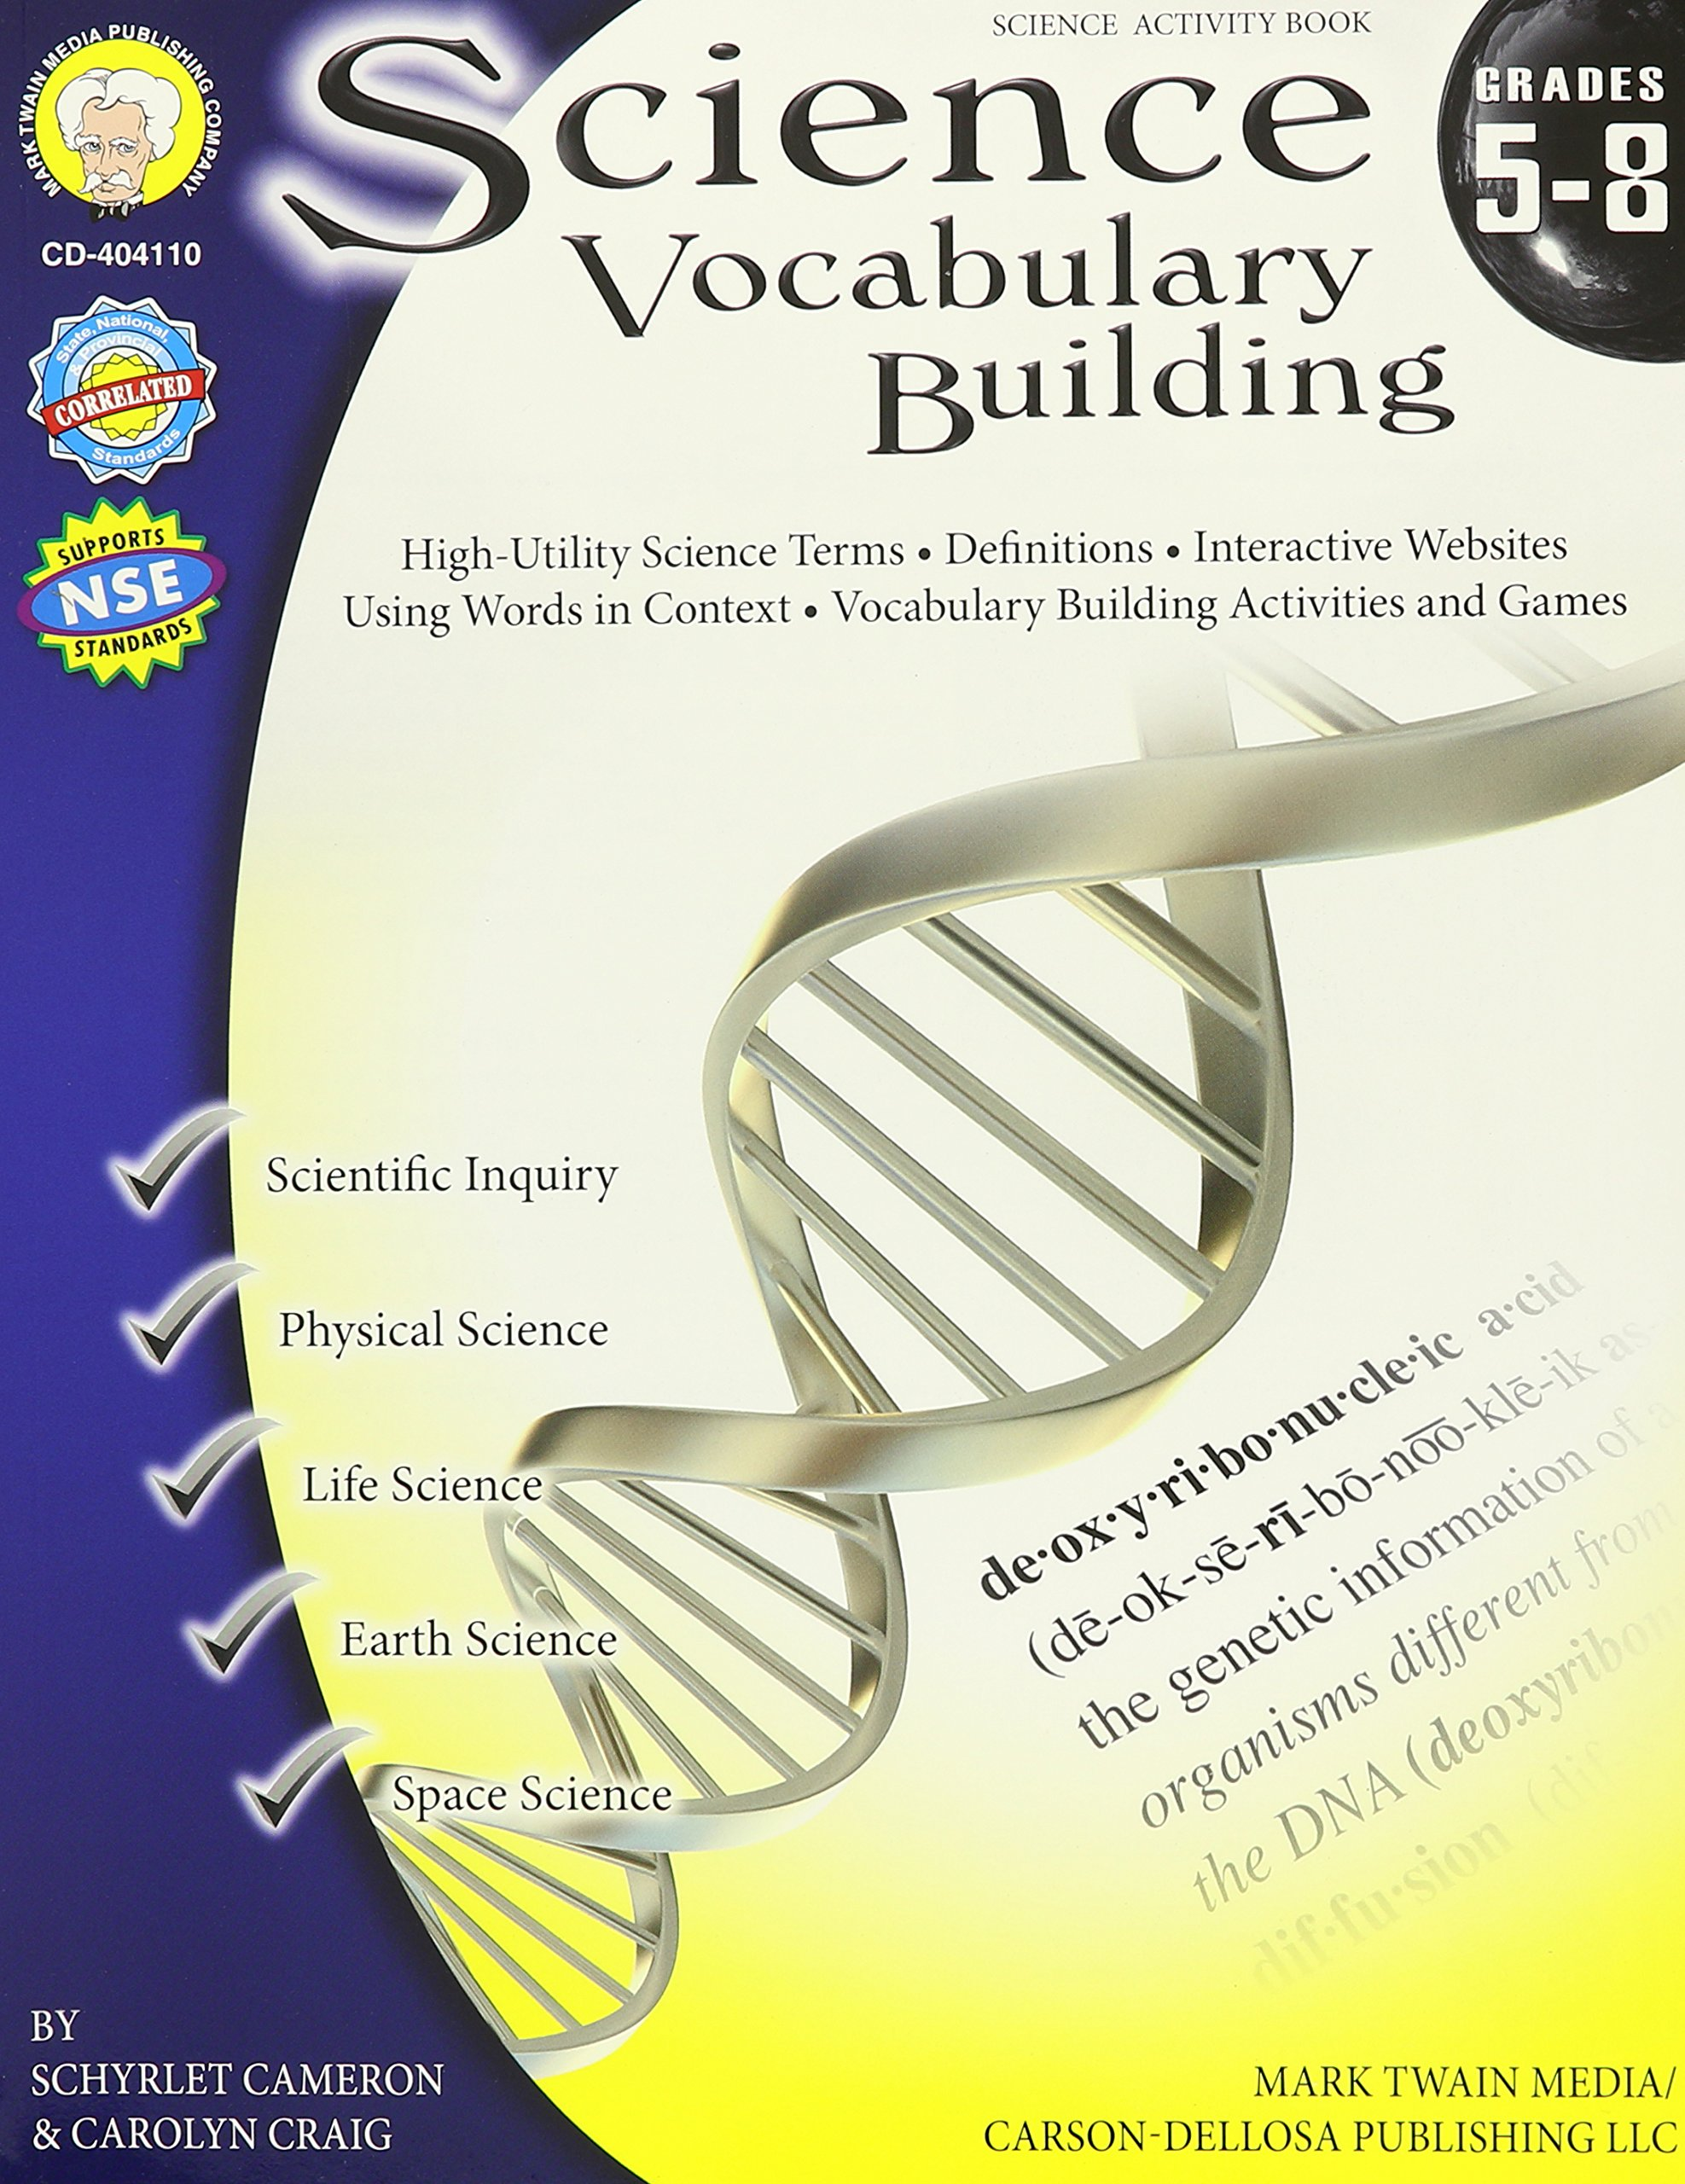 Science Vocabulary Building, Grades 5 - 8: Schyrlet Cameron, Carolyn Craig:  9781580374910: Amazon.com: Books